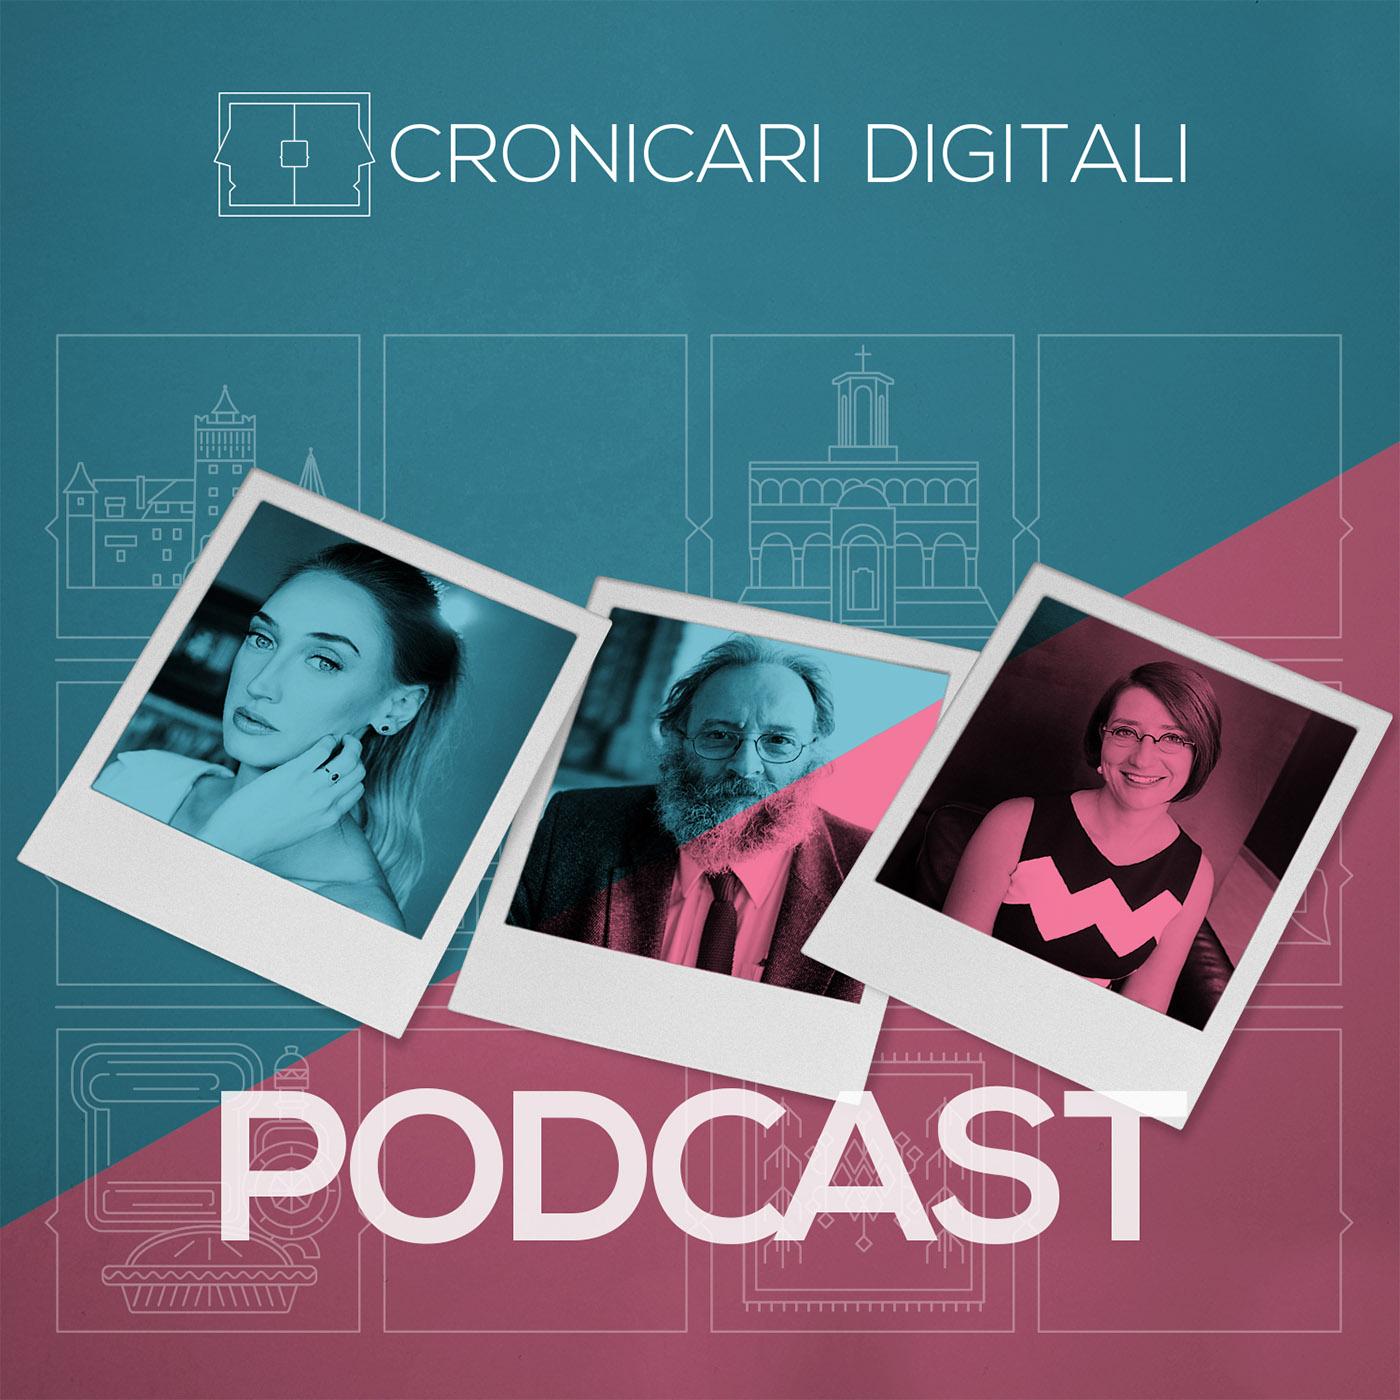 #cronicaridigitali S1 episod 9, Invitați Ilona Brezoianu & arh. Șerban Sturdza & Cristina Hanganu, moderator Cristian Șimonca, aka Blogu lu' Otravă